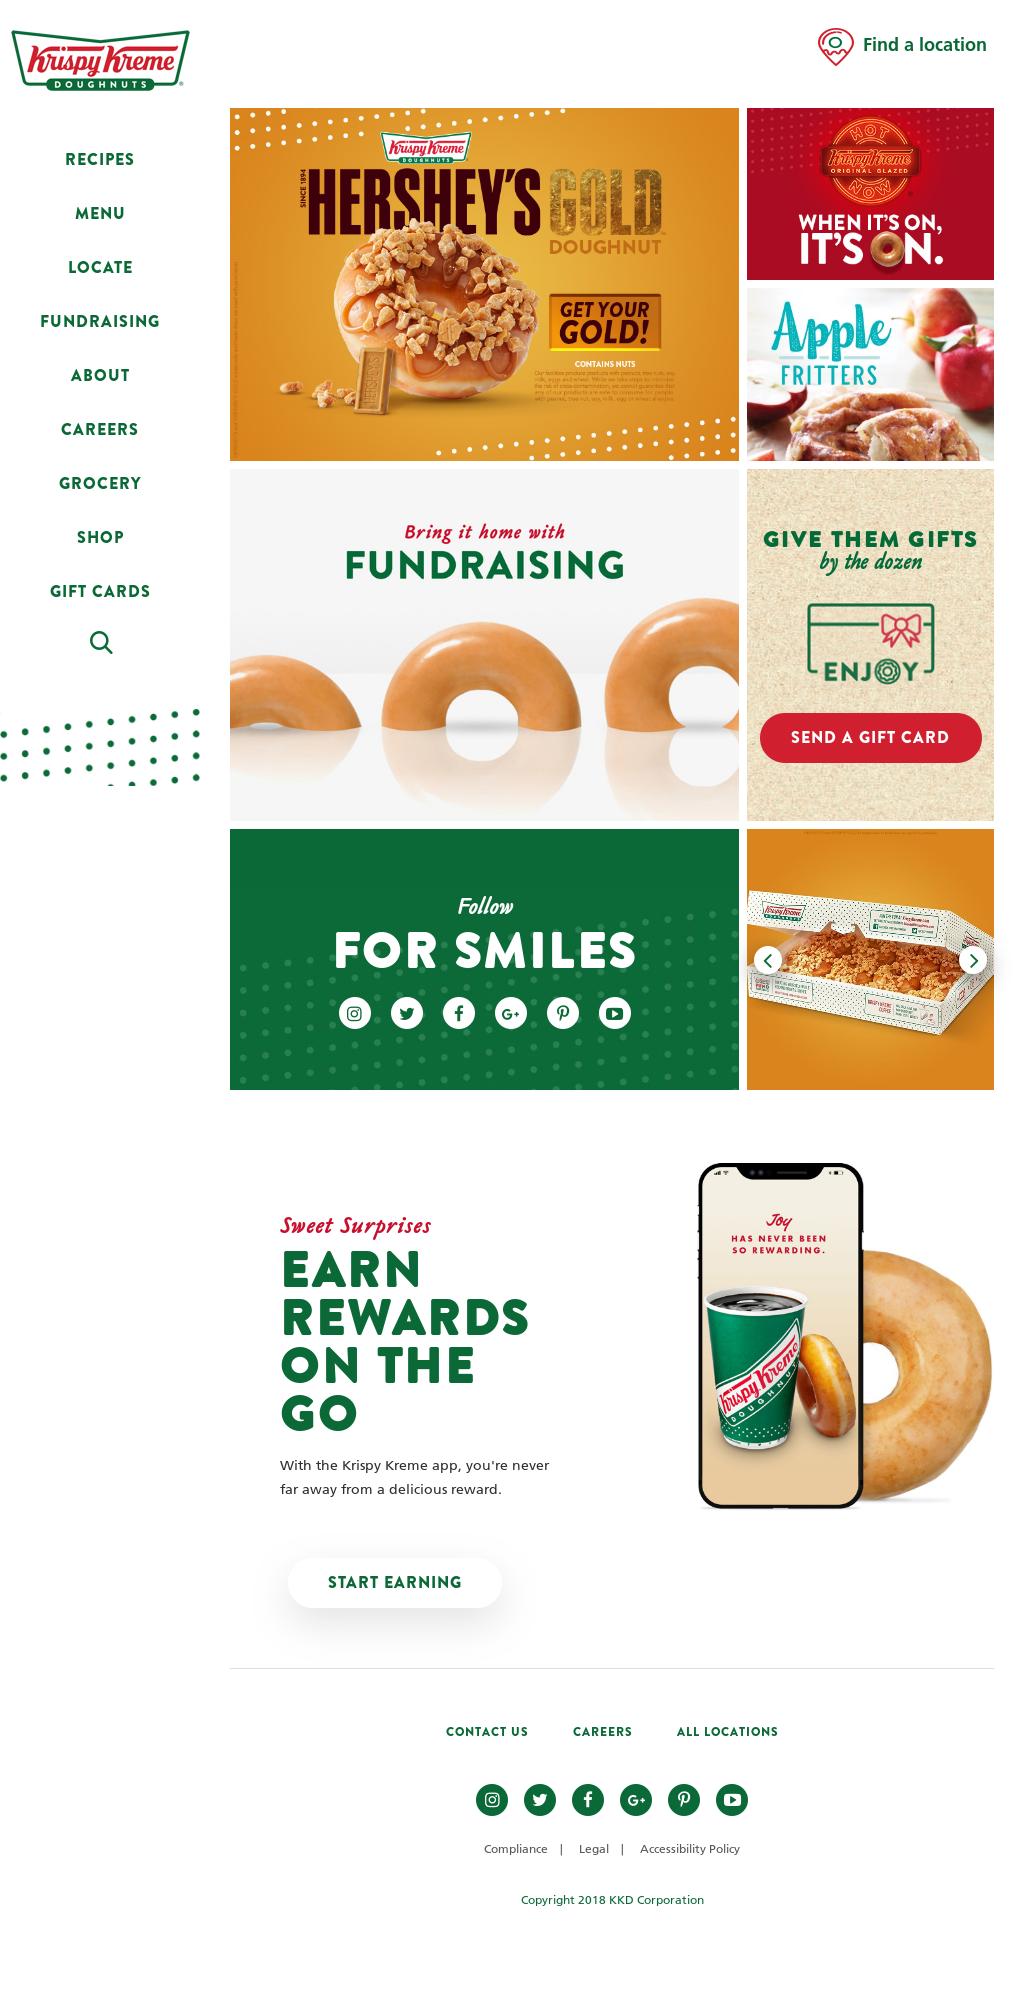 Krispy Kreme Competitors, Revenue and Employees - Owler Company Profile